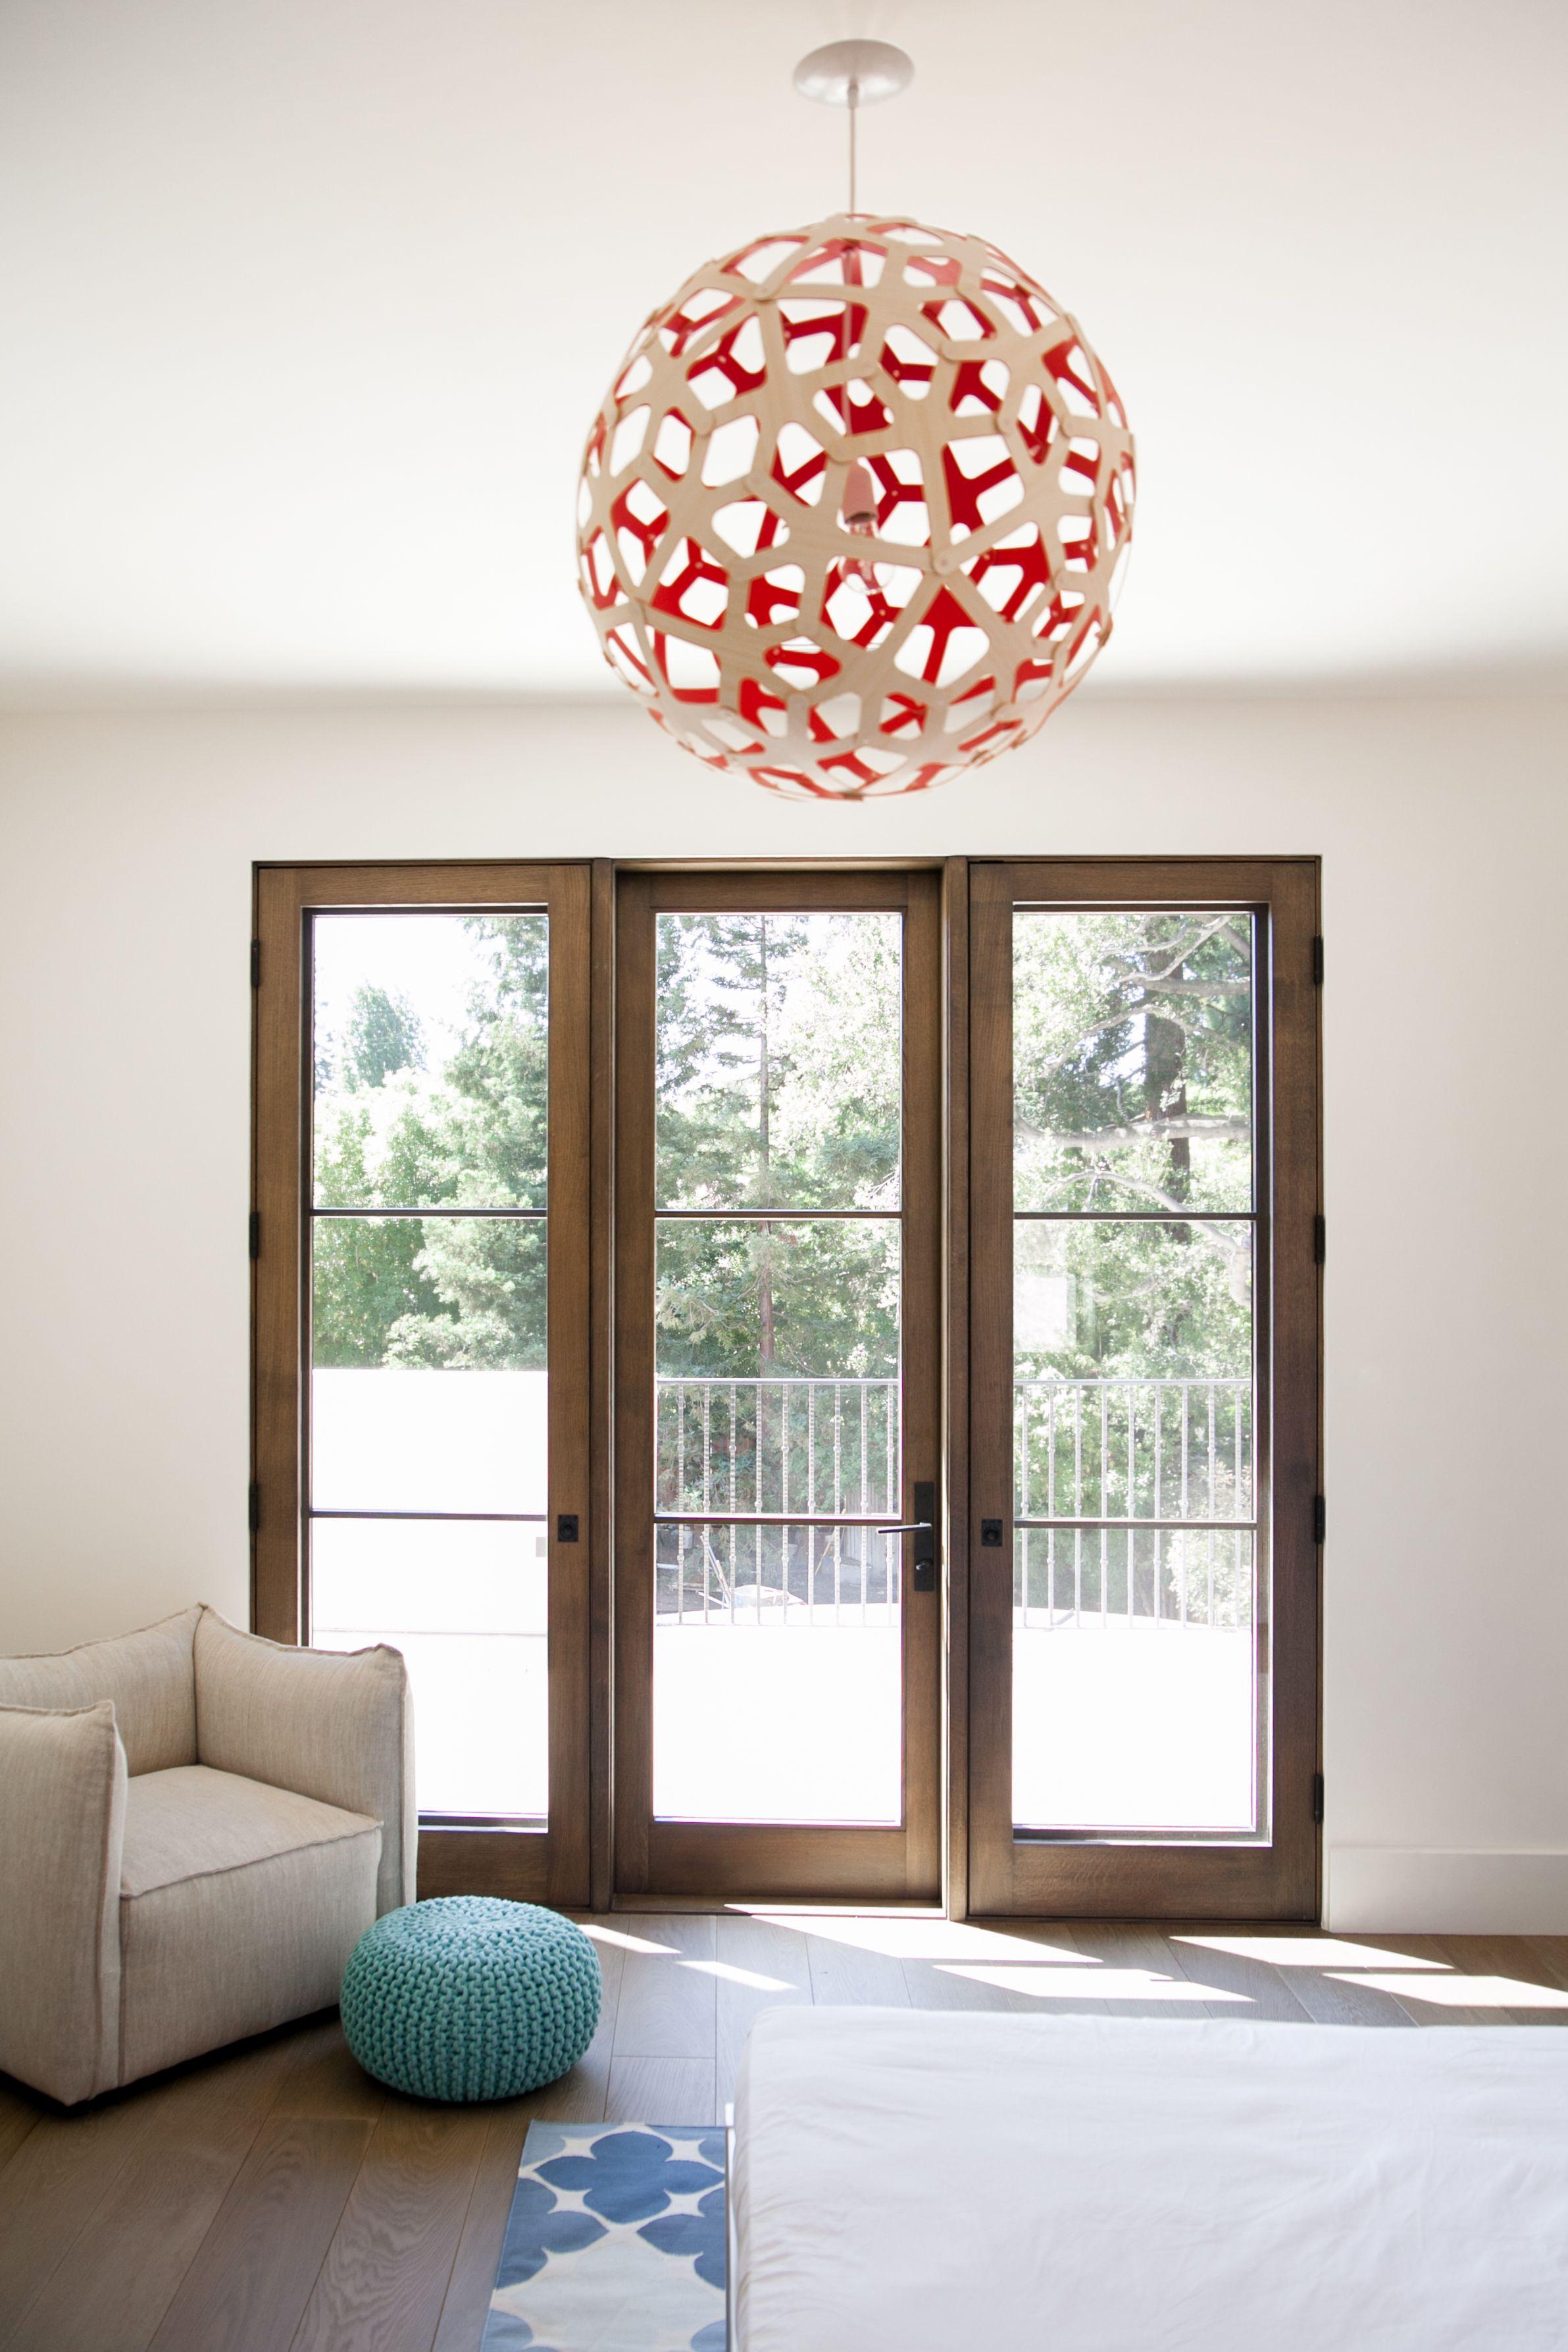 palo alto residence interior design kids bedroom pouf nicolehollis photo by josephine - Interior Design Palo Alto